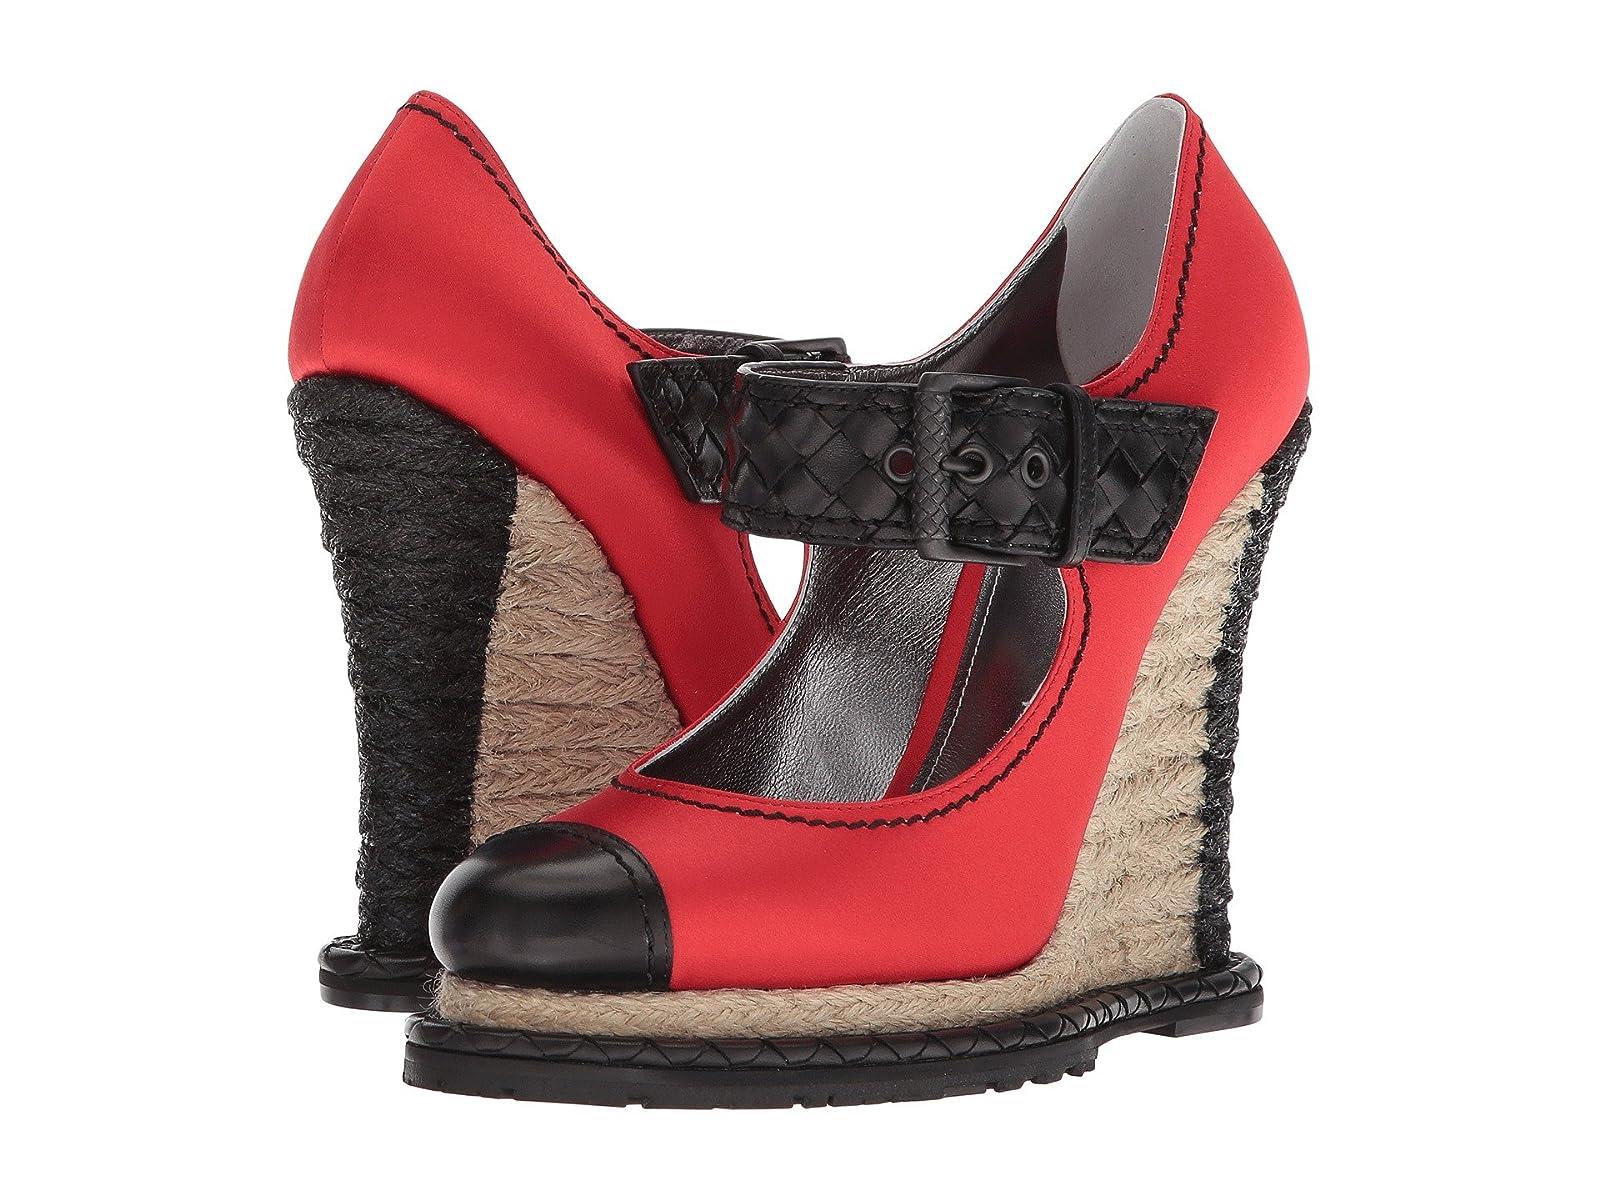 Bottega Veneta Buckle WedgeAtmospheric grades have affordable shoes